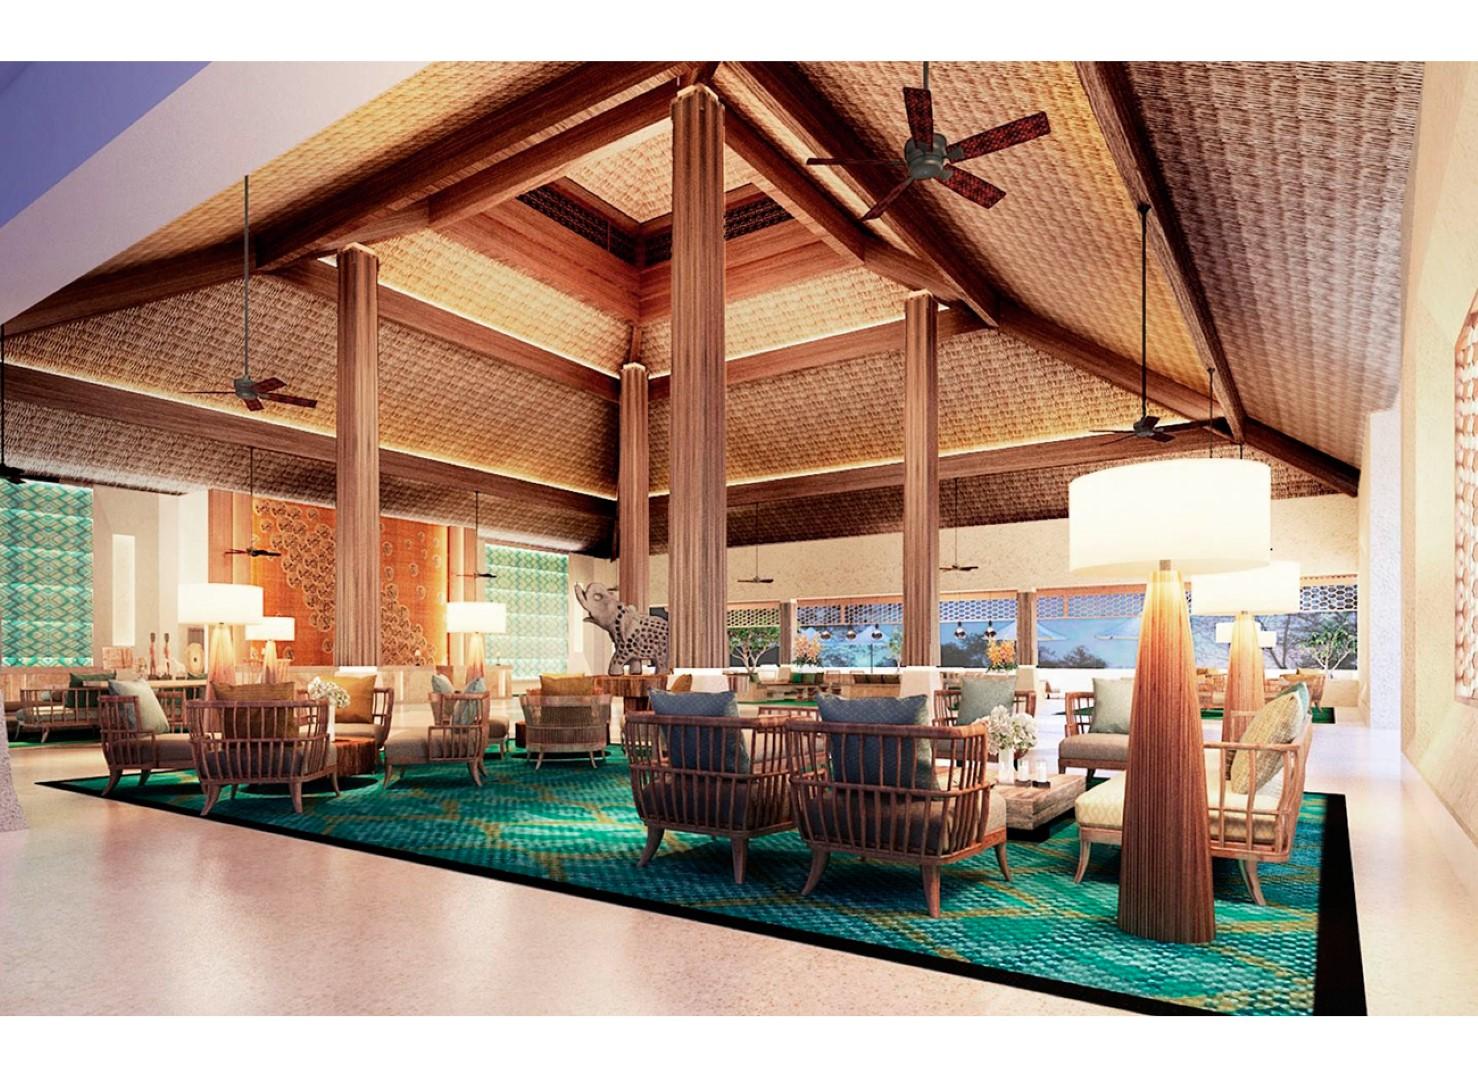 PG-SLHT-Ceylon-Lounge-Main-Lobby-Photo_Gallery-1300x950 (Large)